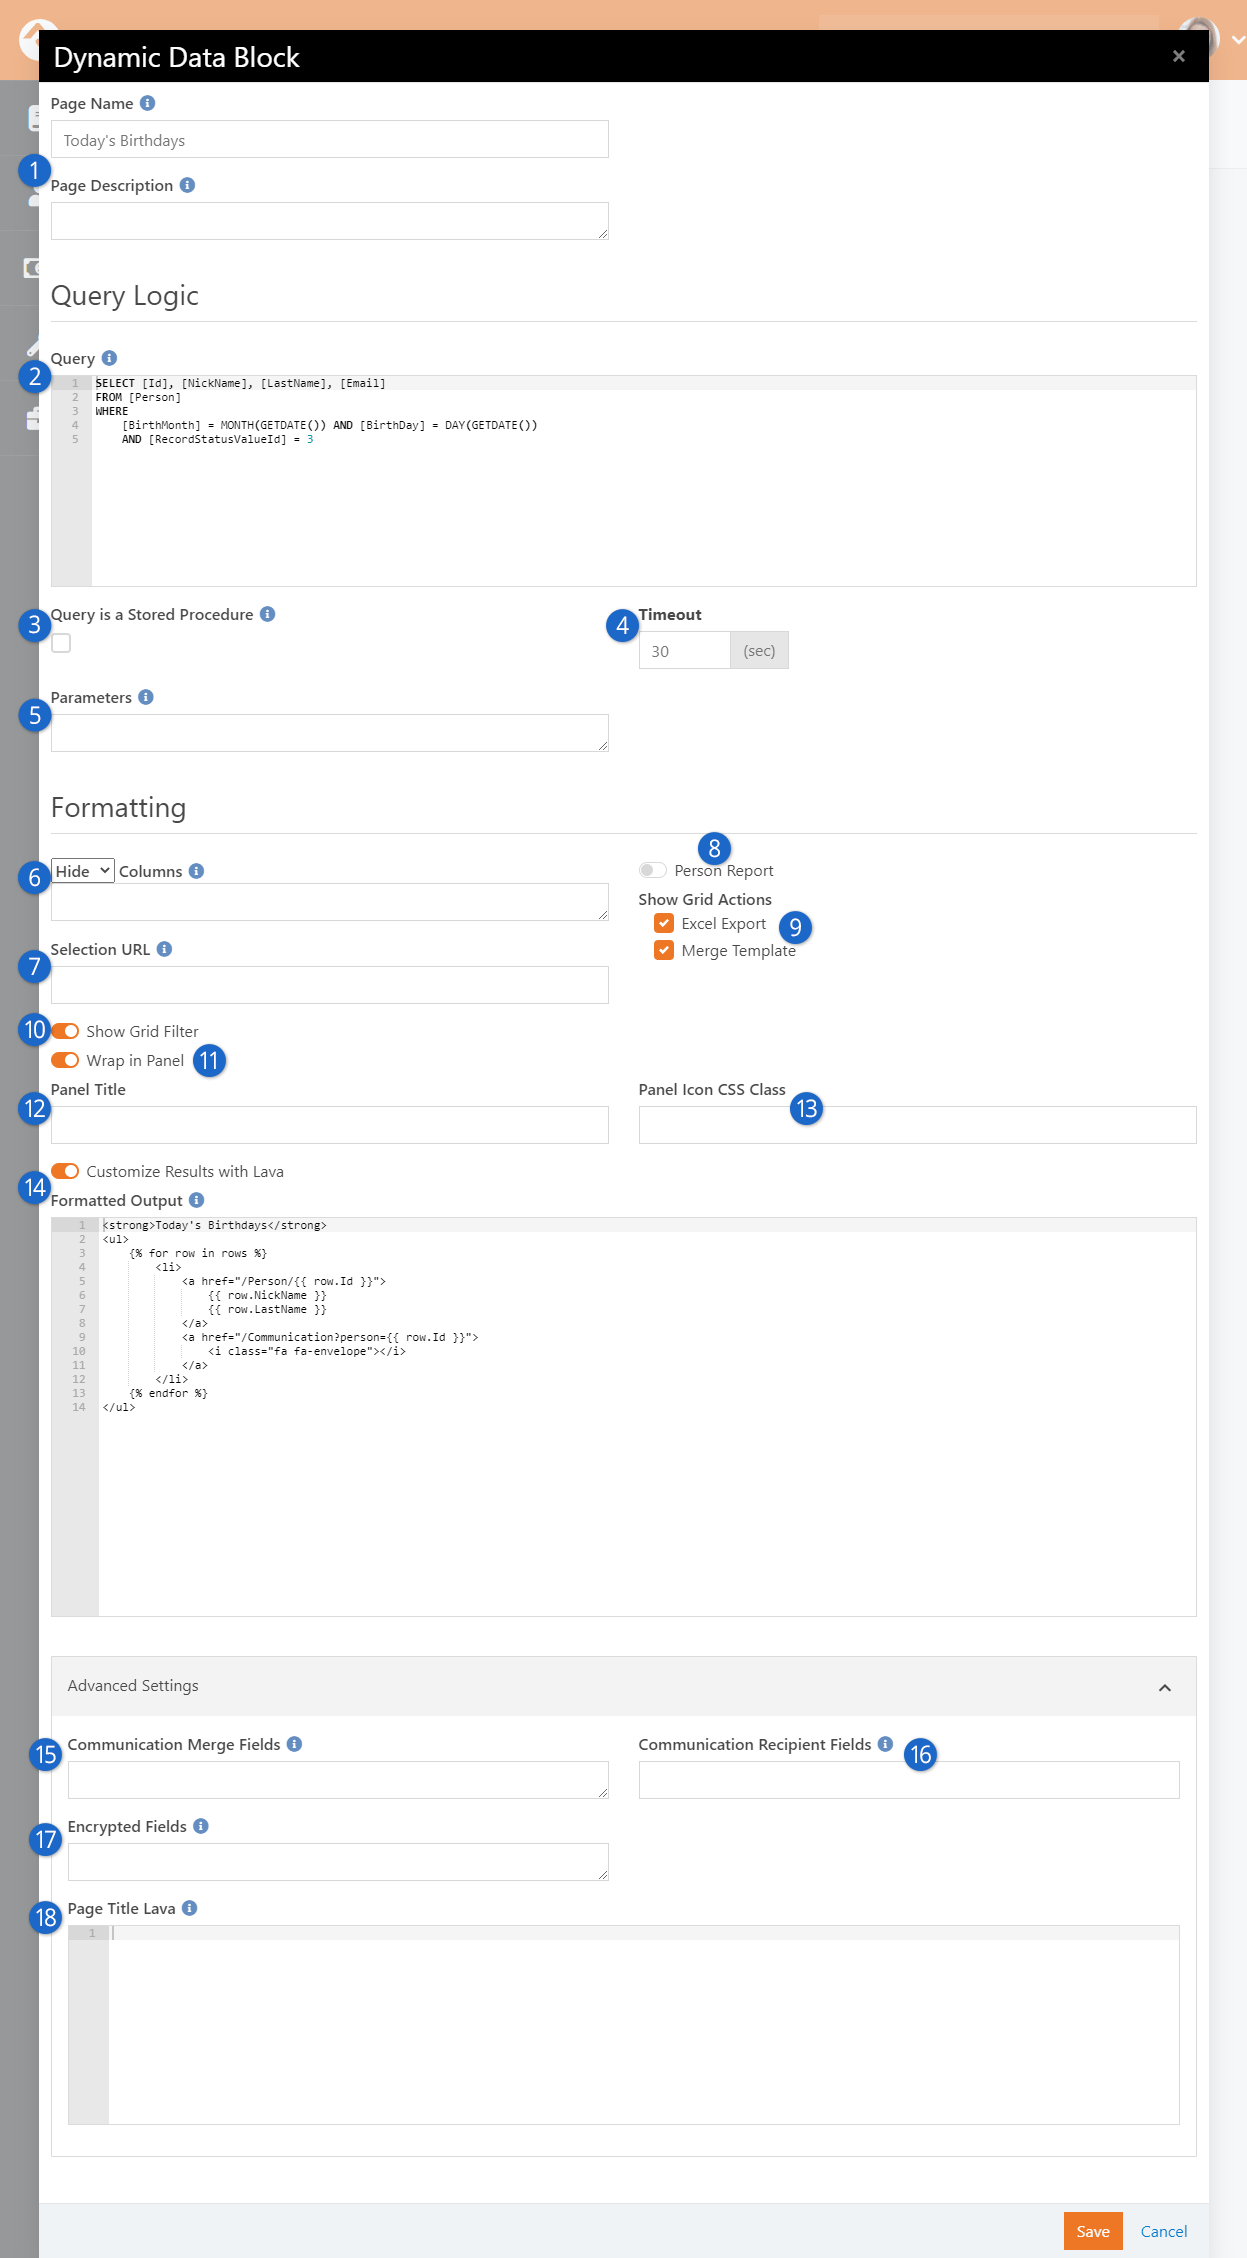 Dynamic Data Block